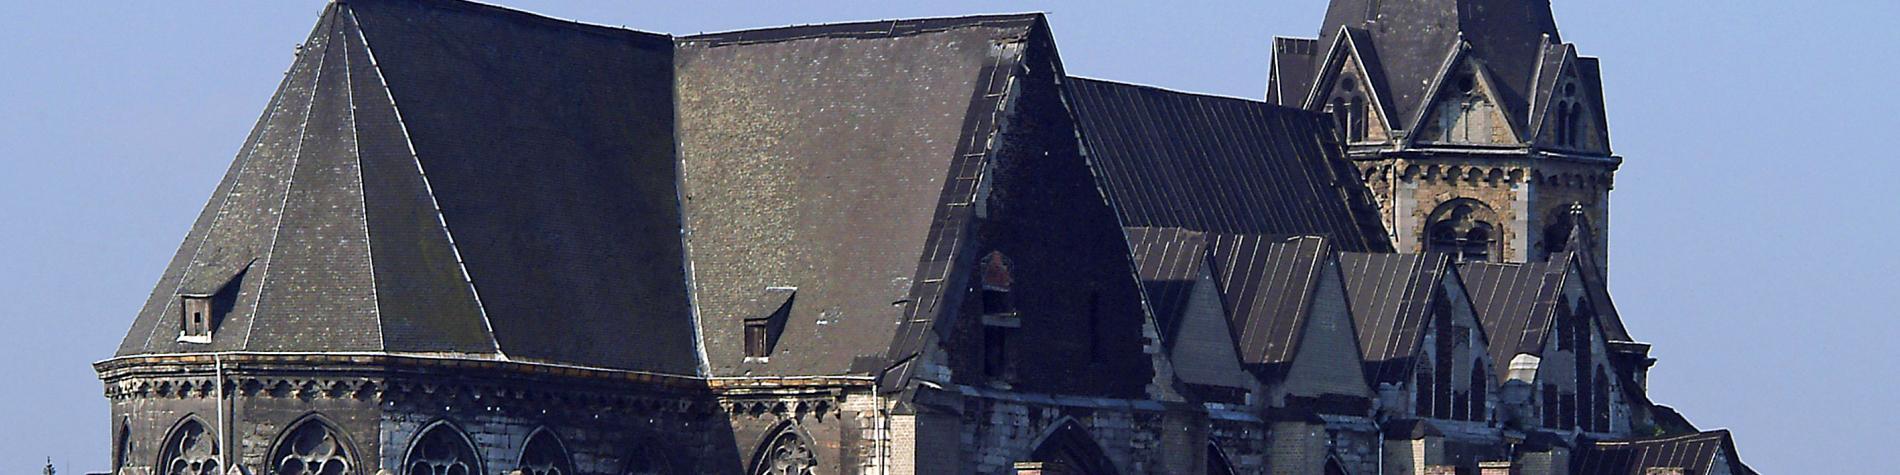 Eglise Sainte-Croix à Liège